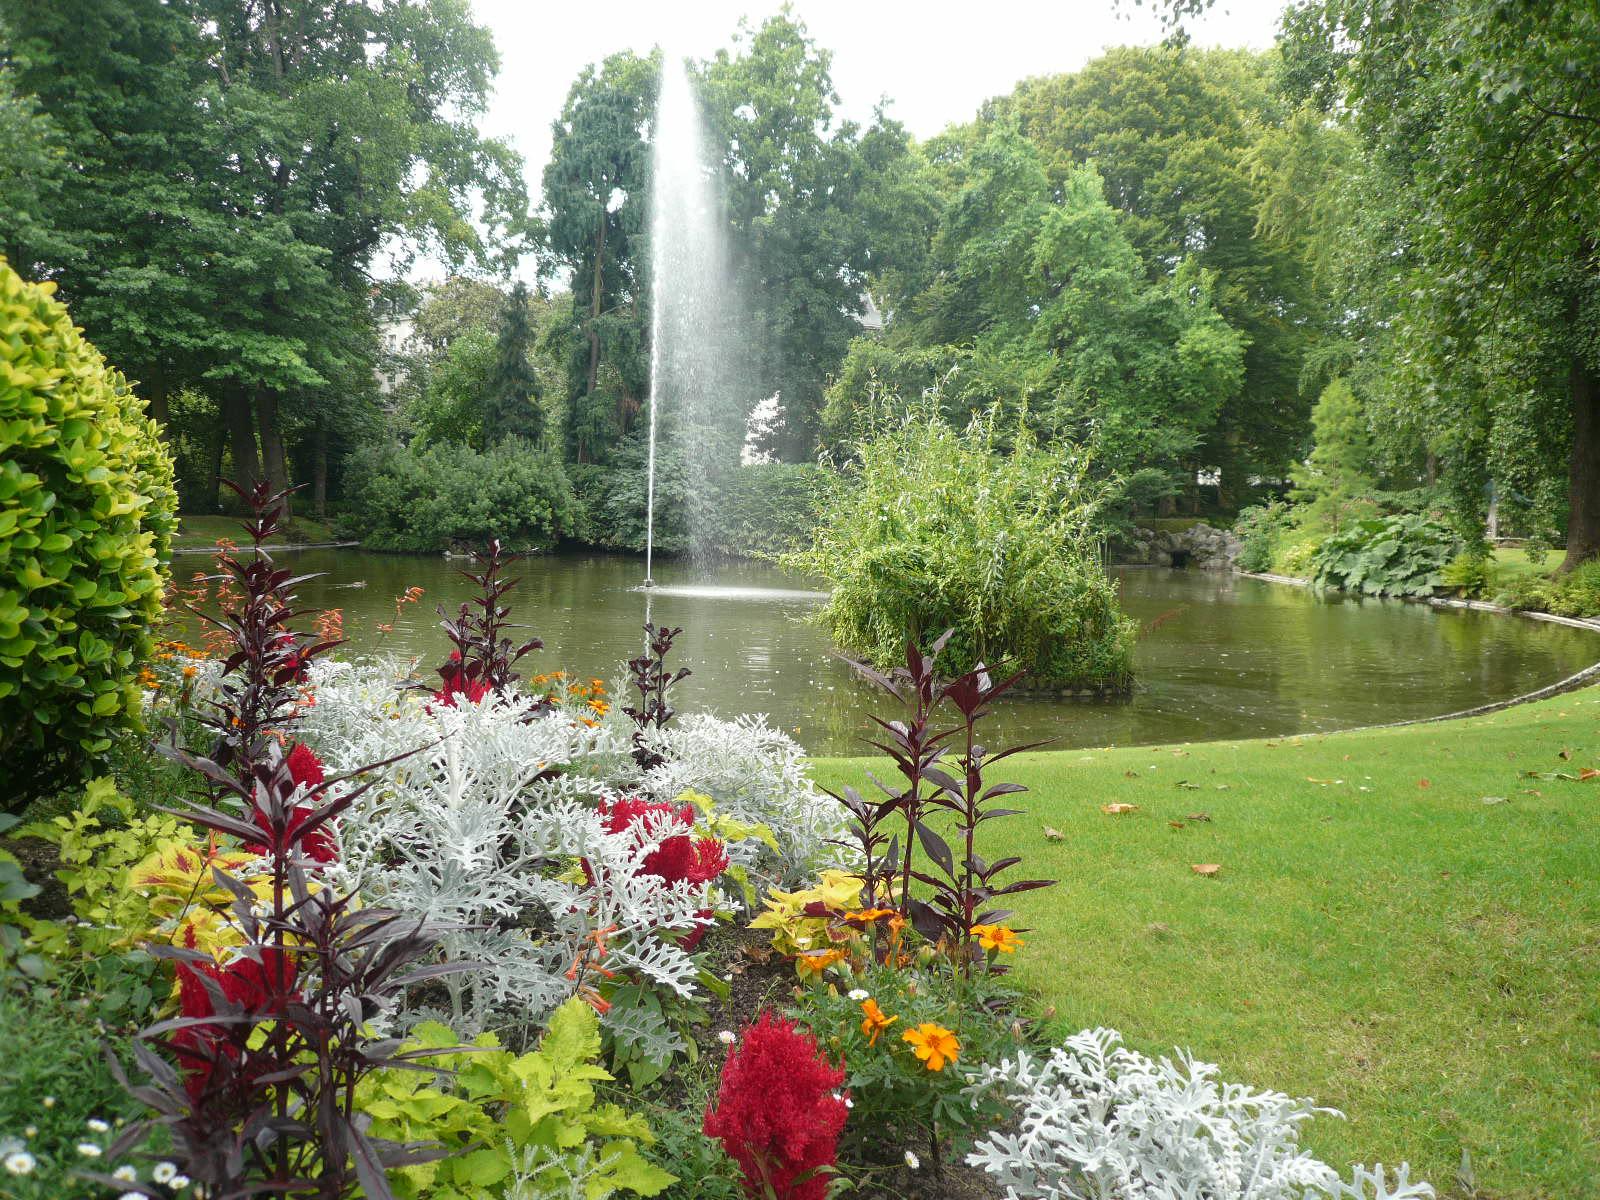 P Jardin des plantes Nantes JPG